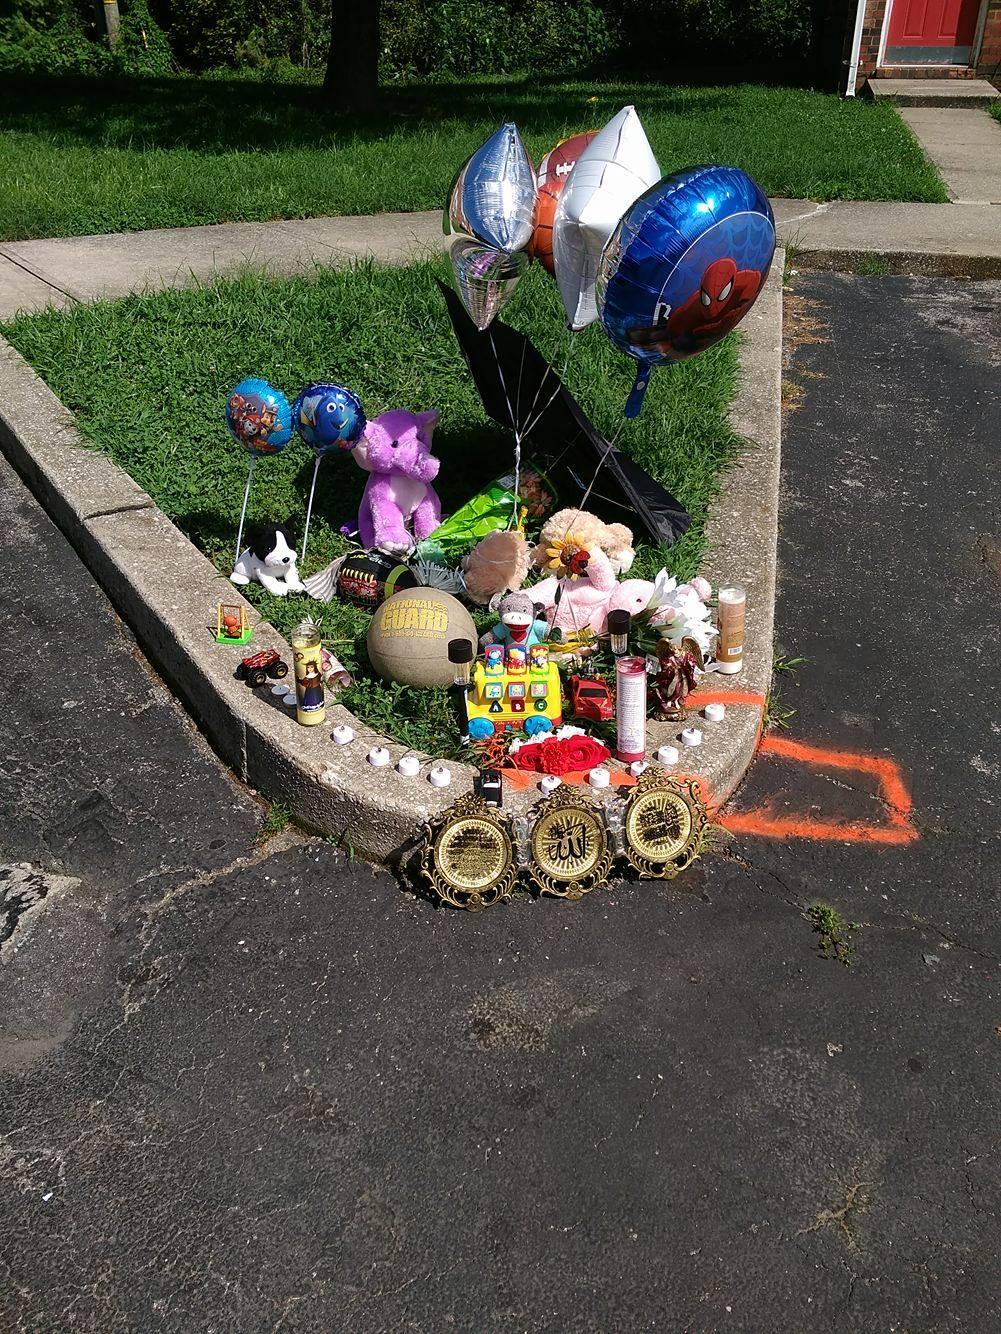 A memorial set up by neighbors.